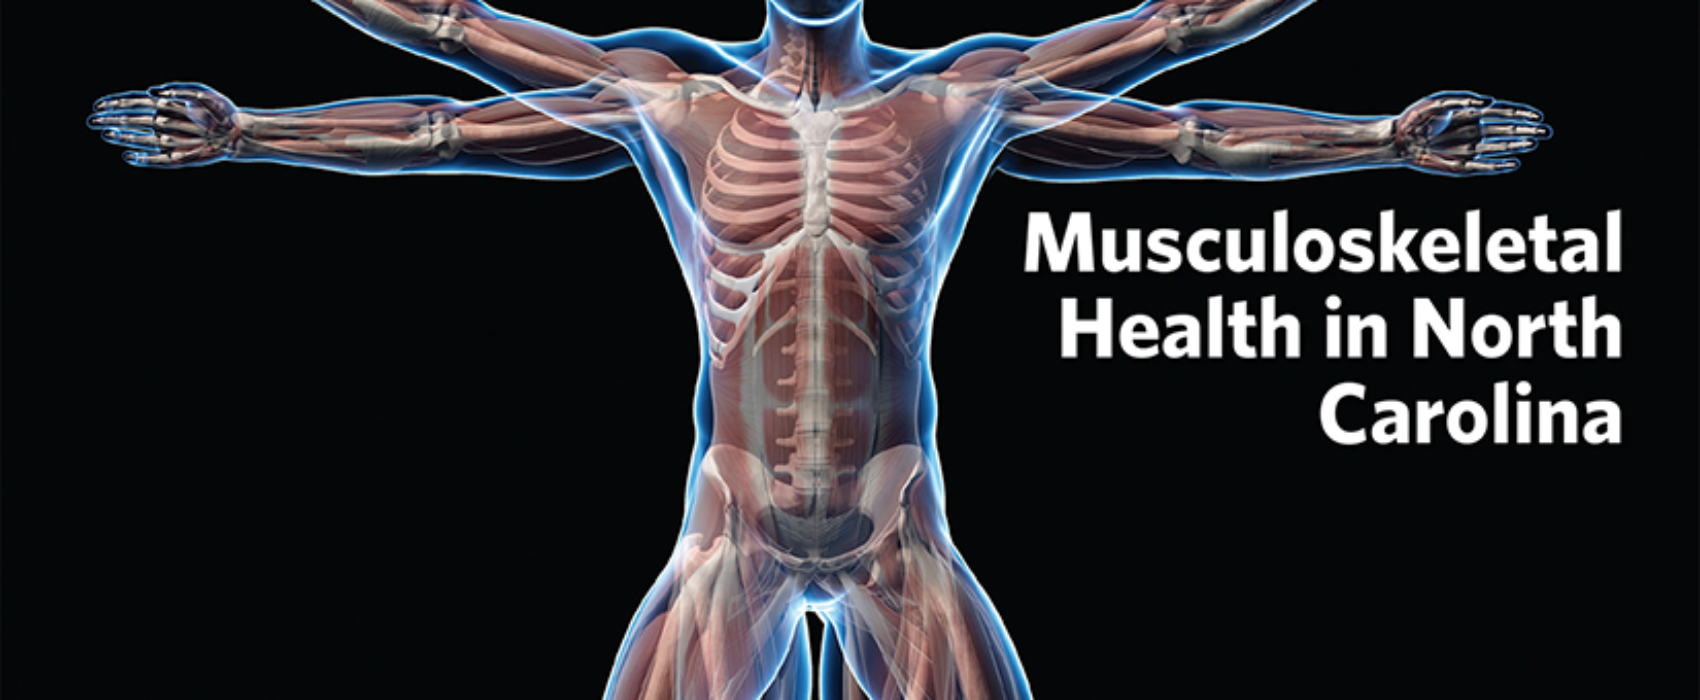 Musculoskeletal Health in North Carolina